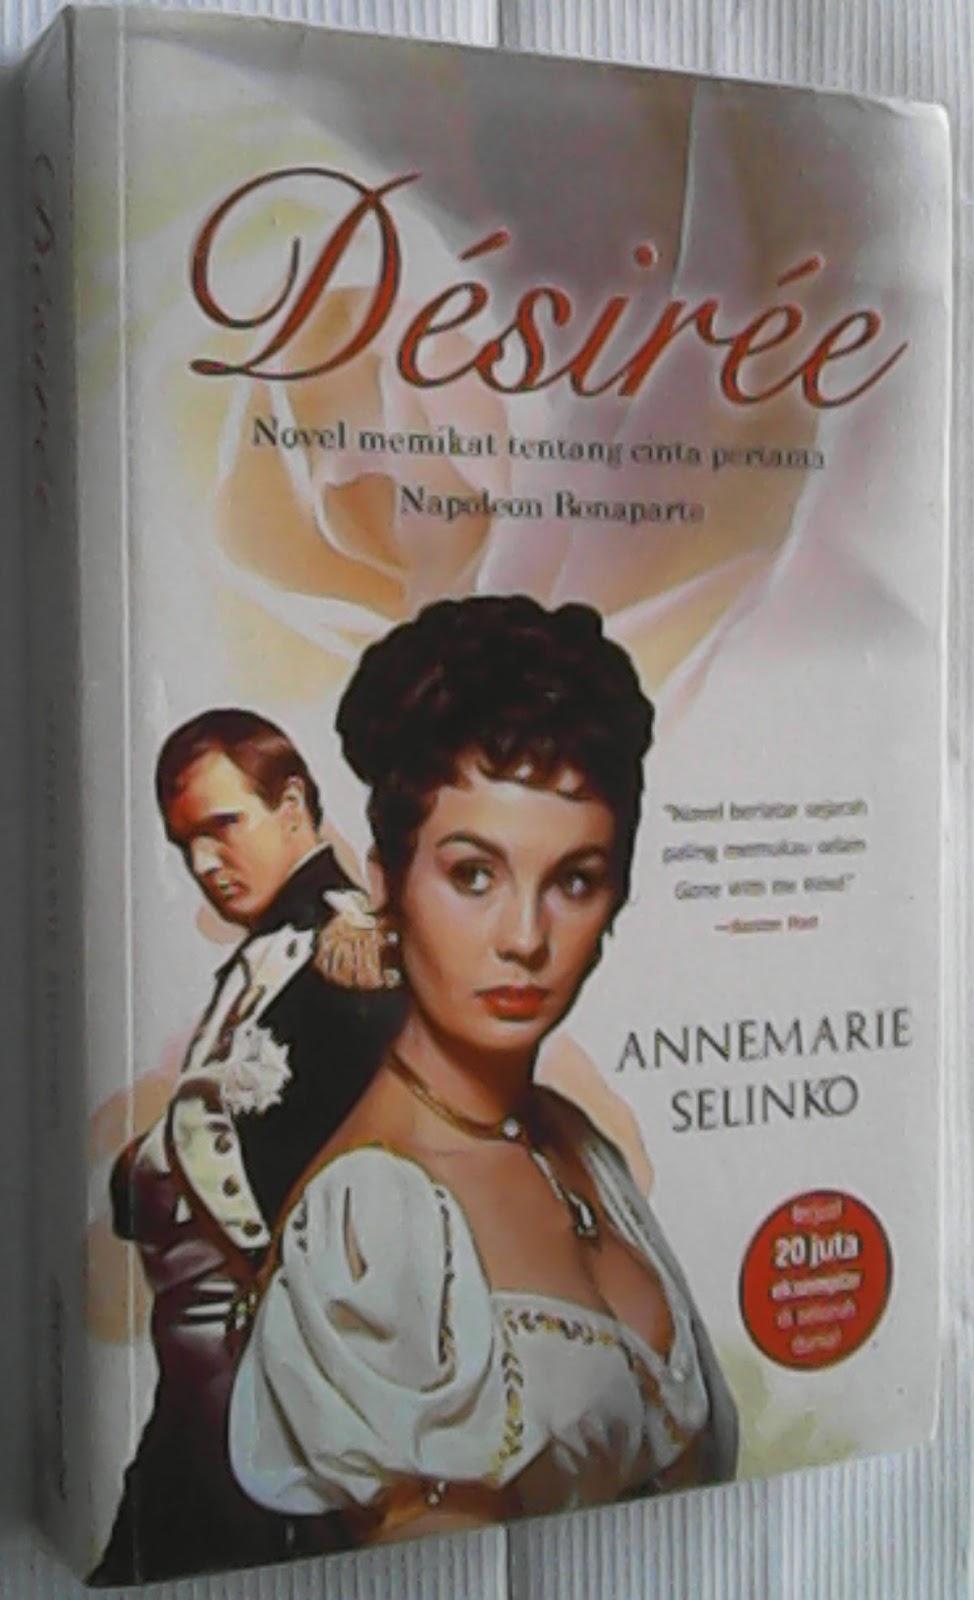 Pdf novel terjemahan dewasa romantis